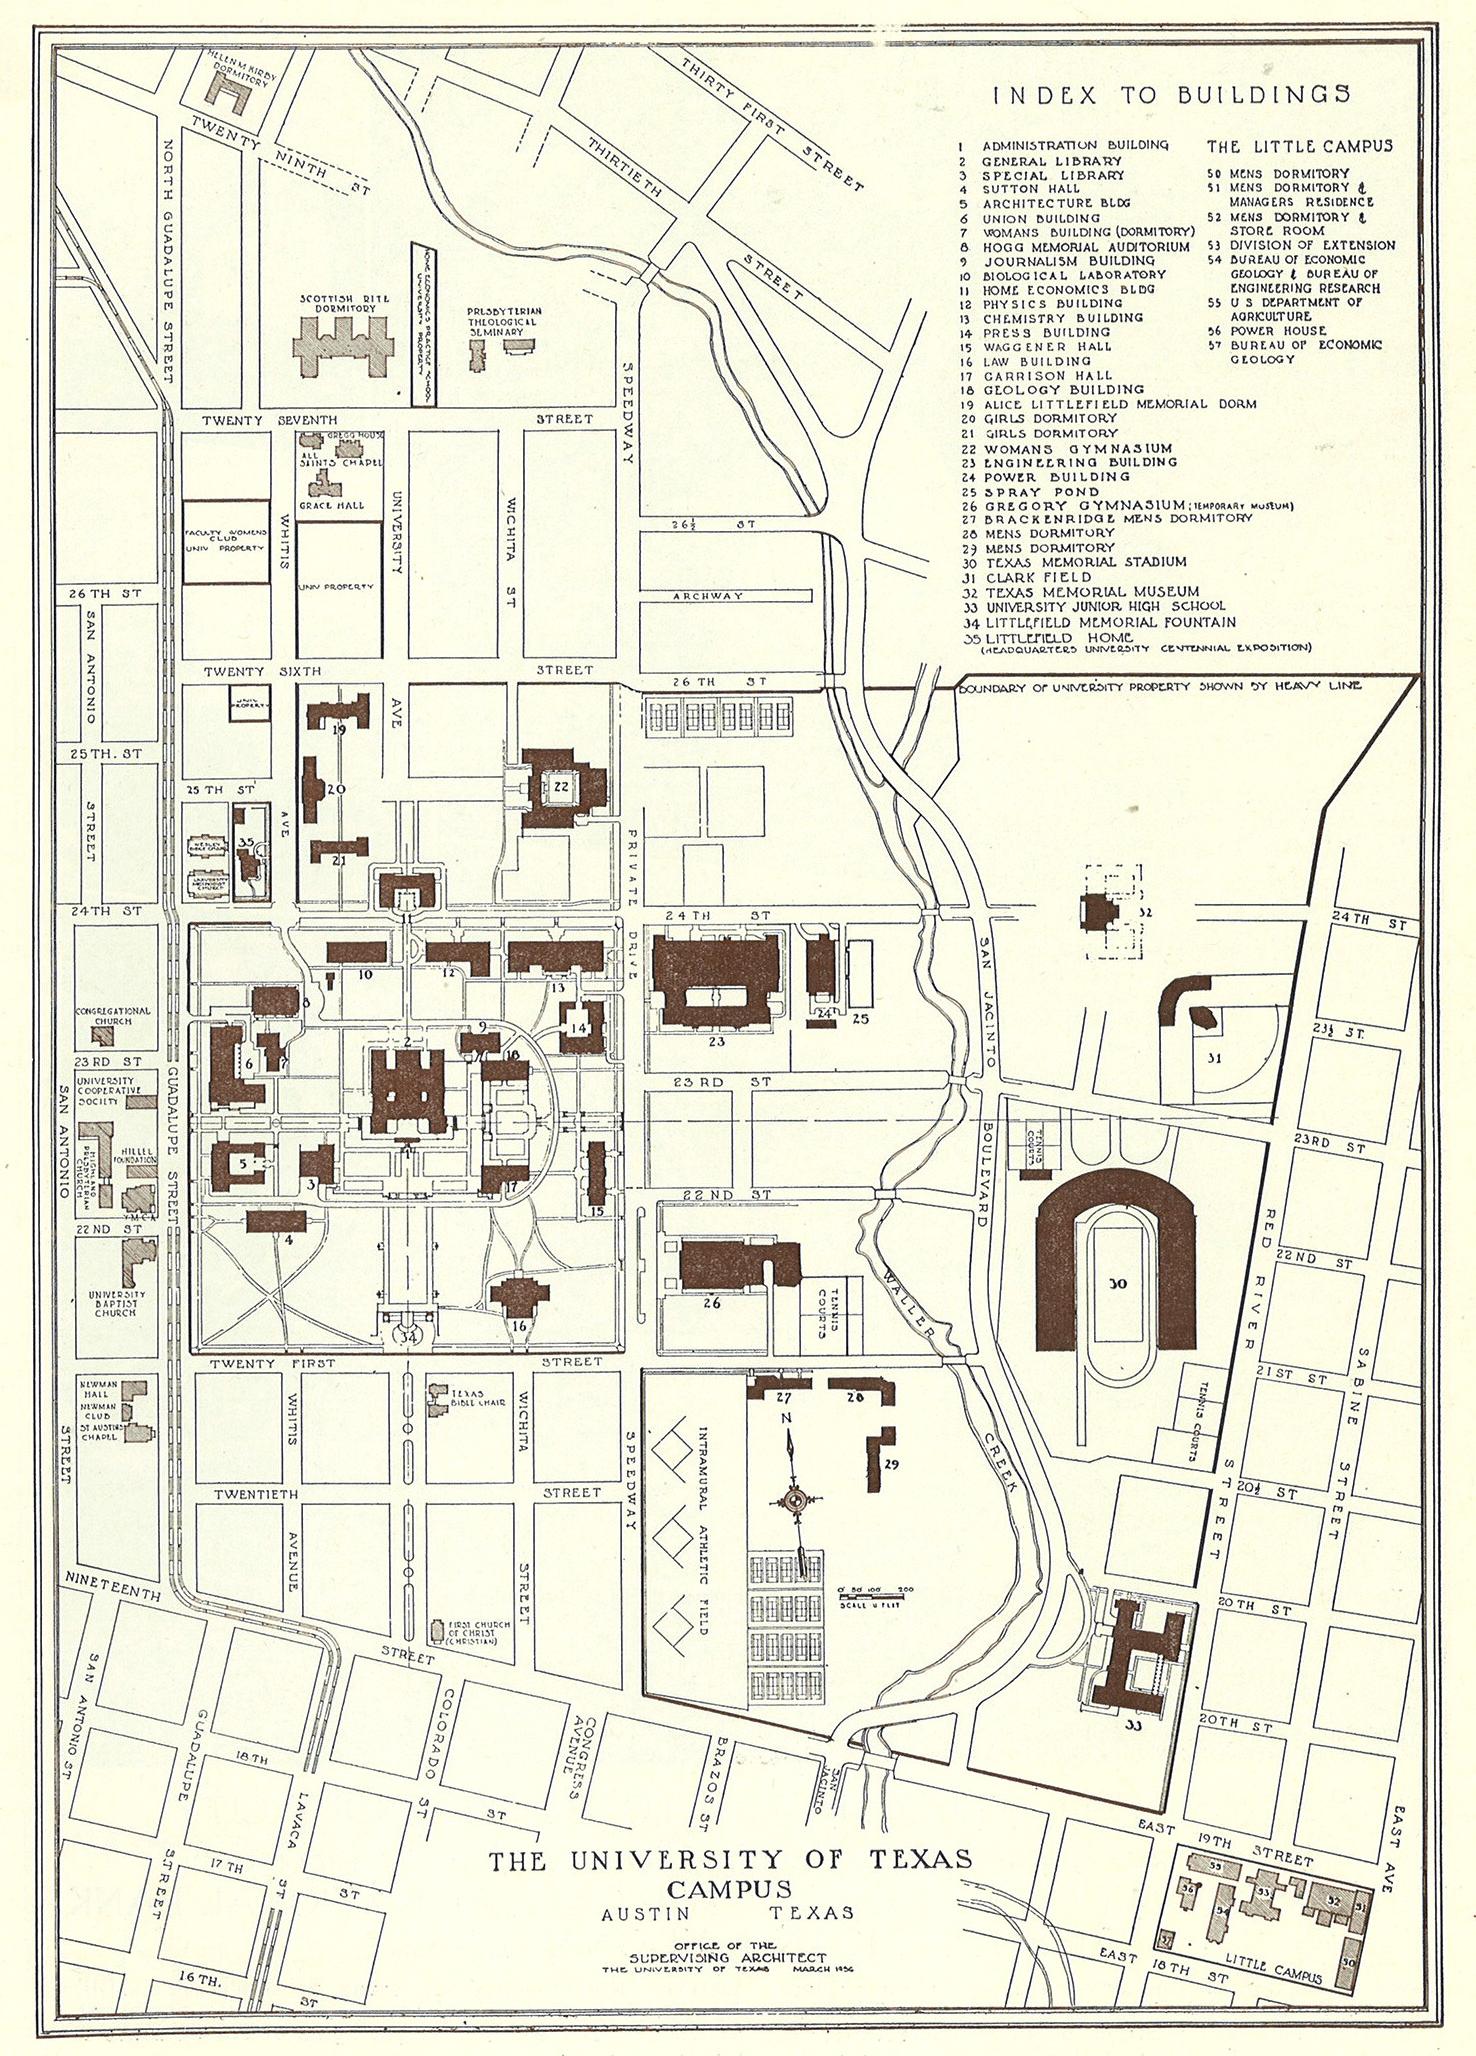 university of texas austin map Historical Campus Maps University Of Texas At Austin Perry university of texas austin map